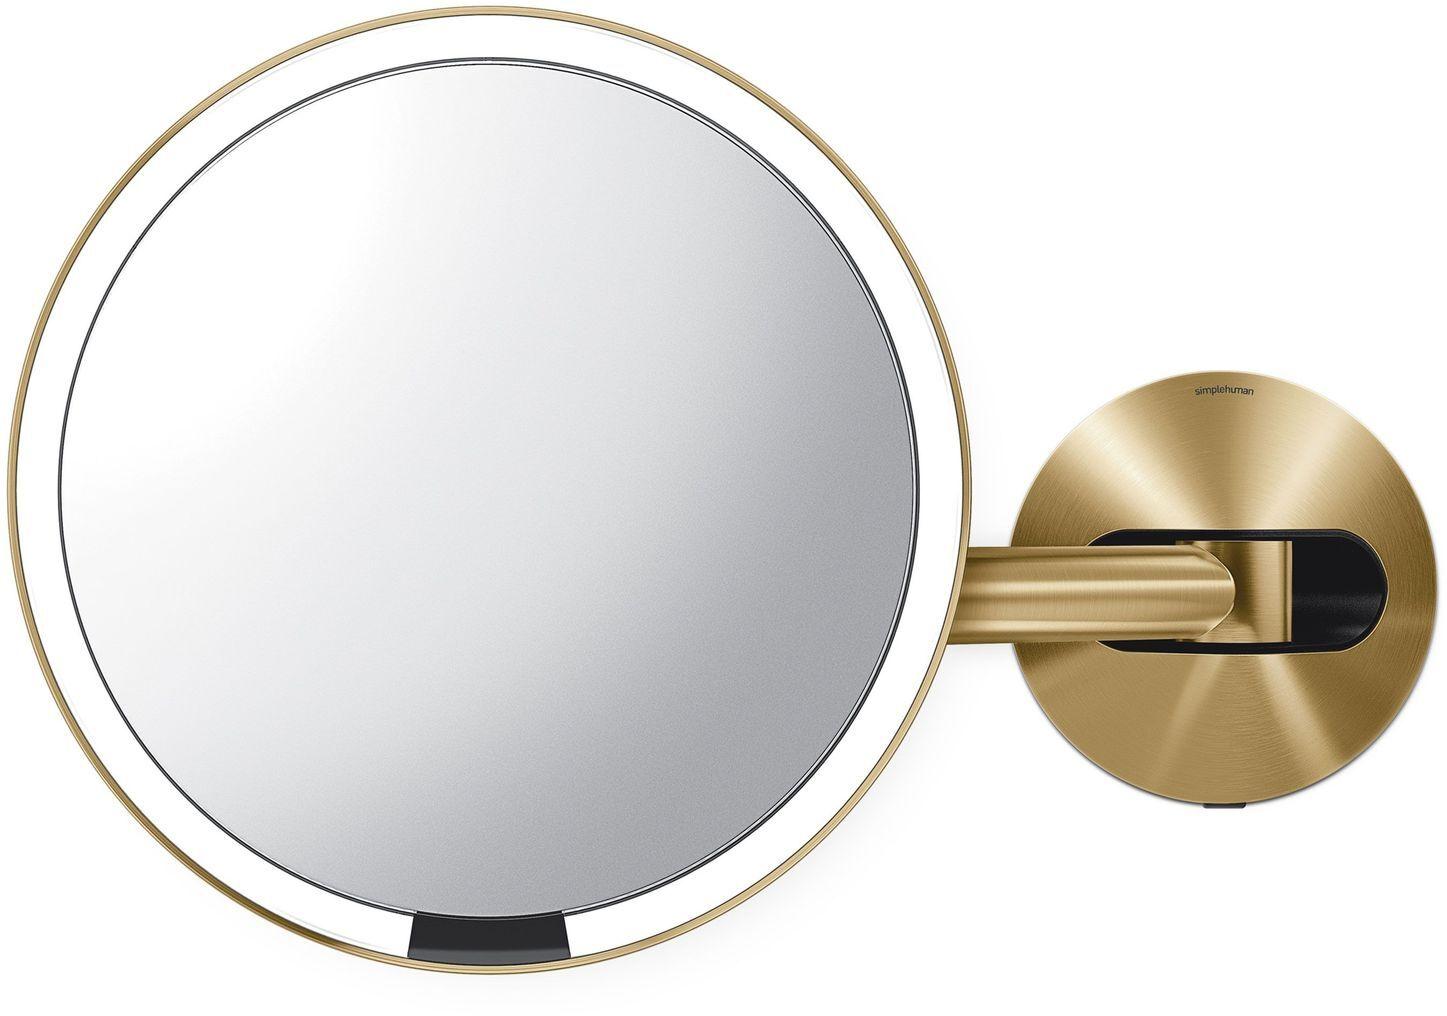 Simplehuman Sensor Miroir Maquillage - Laiton - Rechargeable